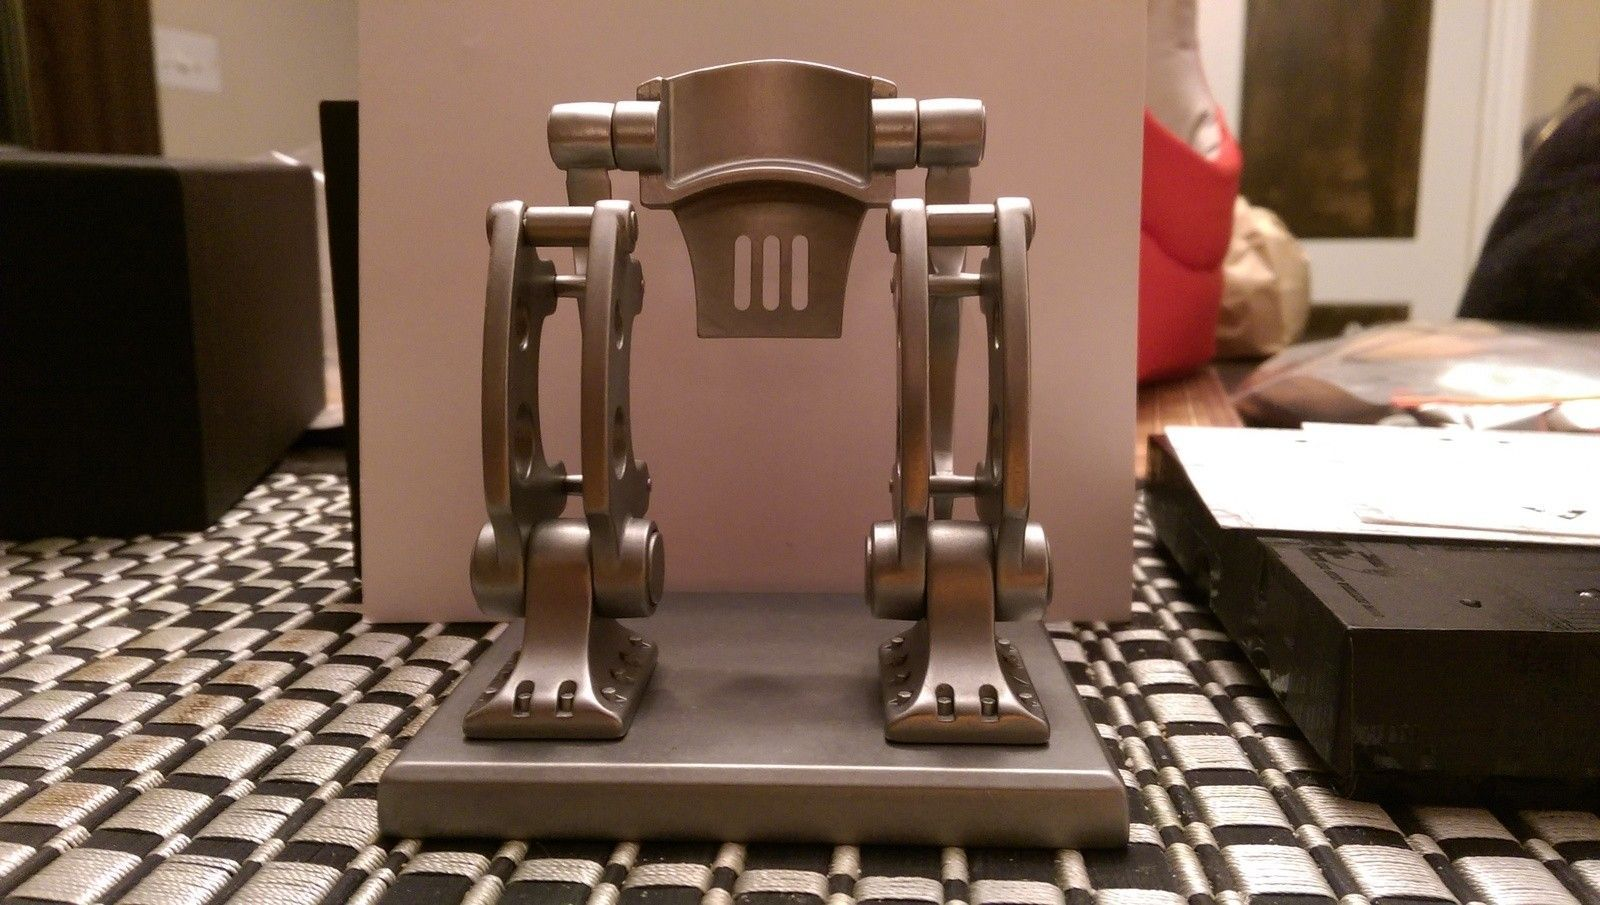 Robotic store front #499 - IMAG0526.jpg